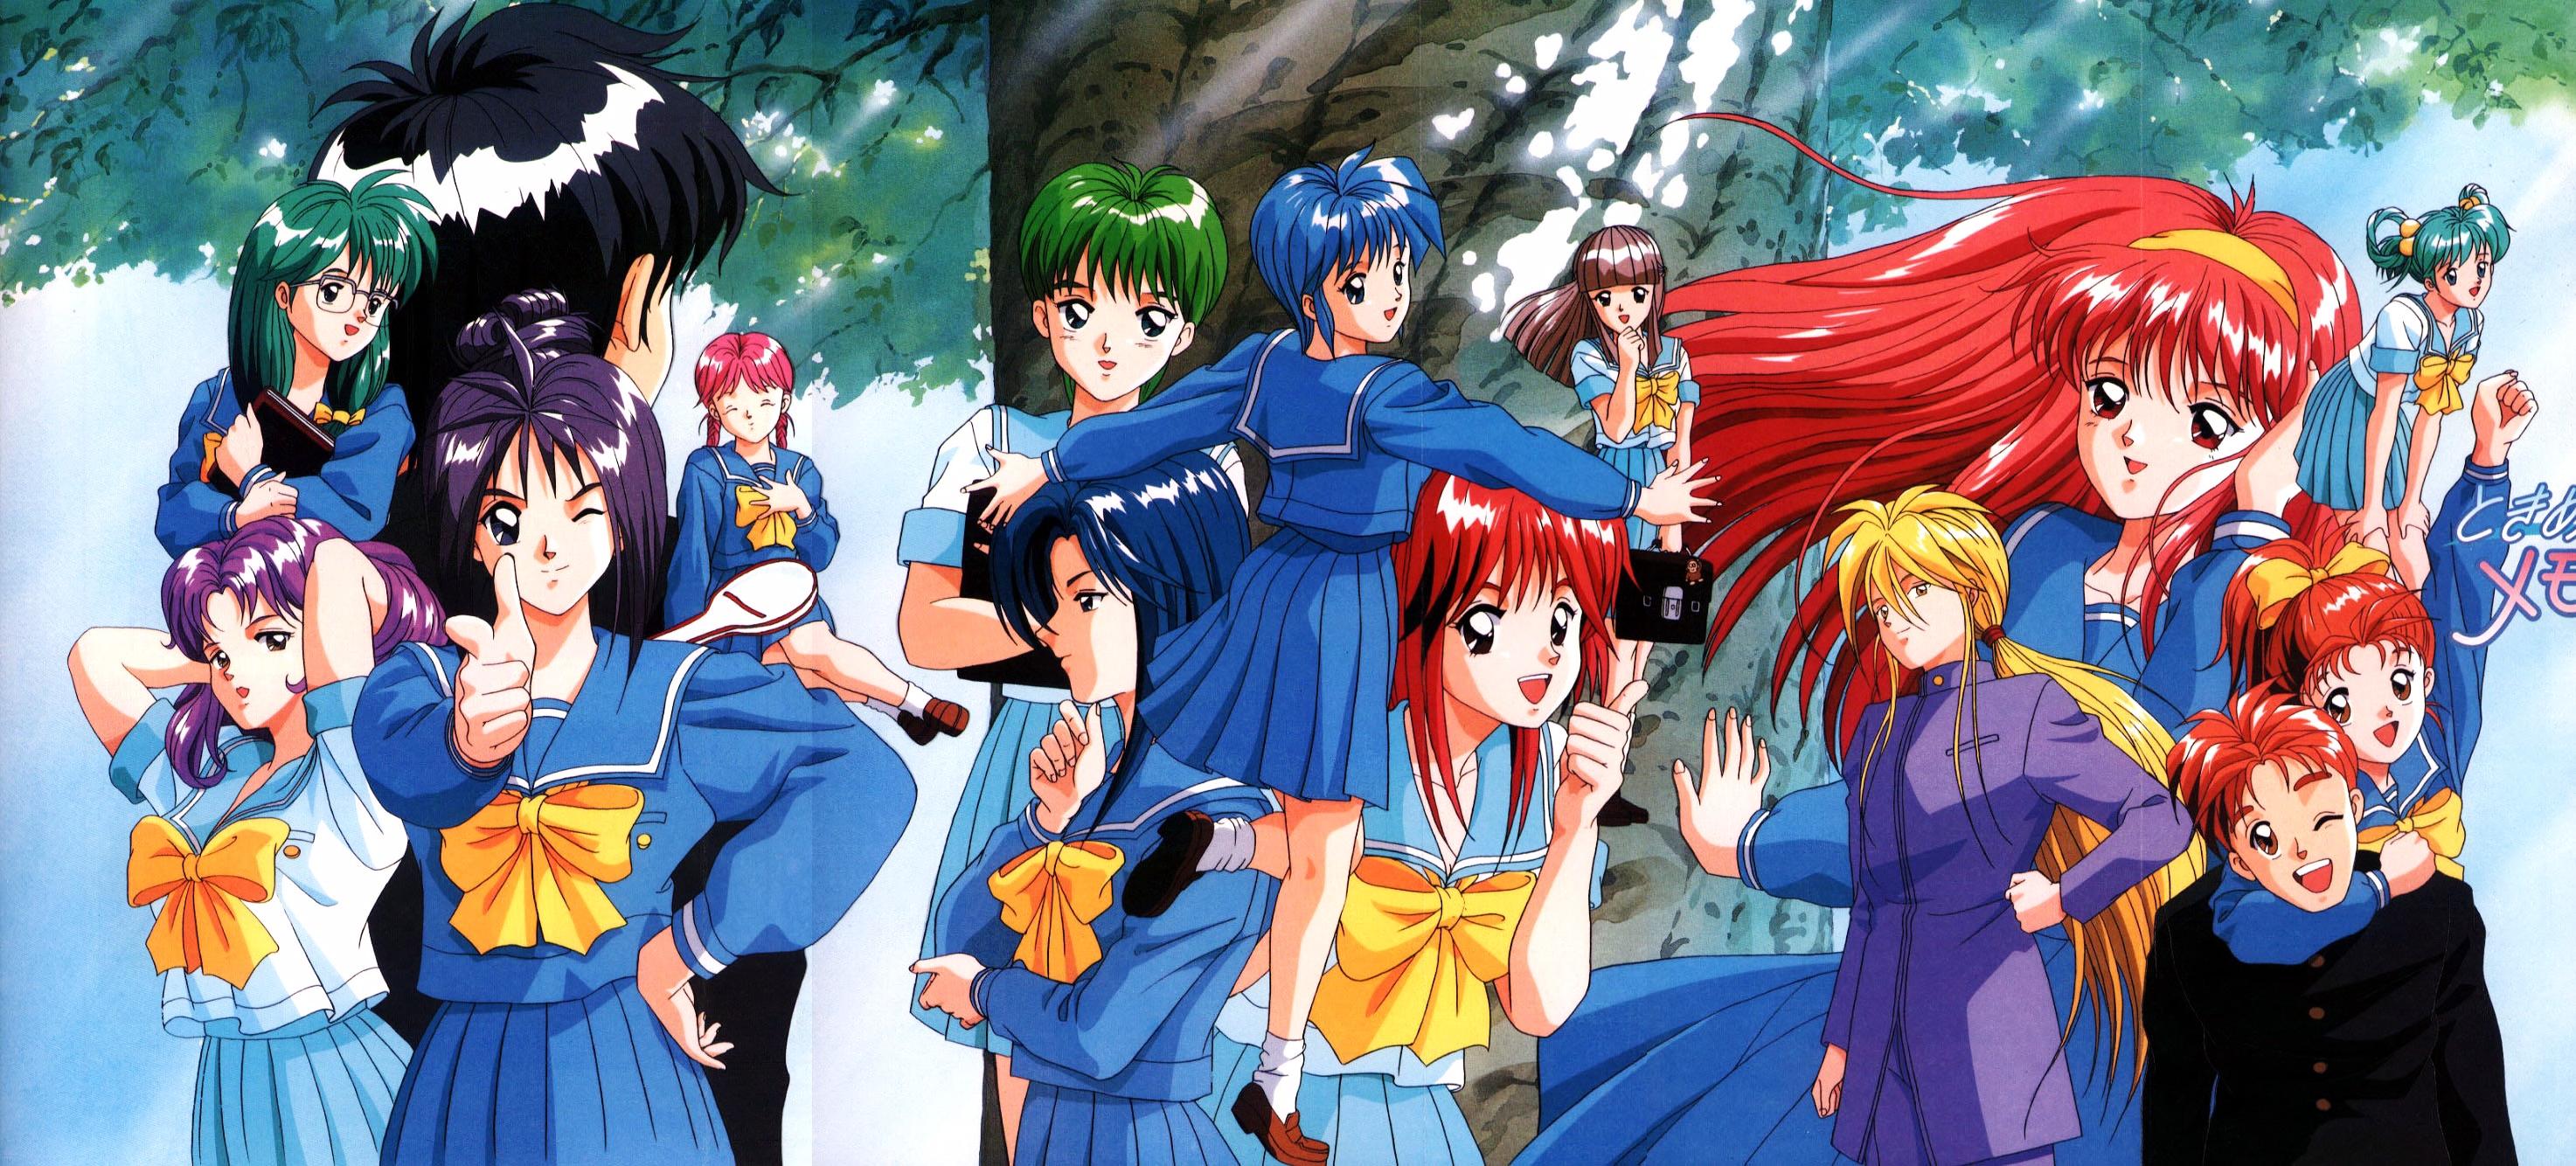 Tokimeki Memorial Zerochan Anime Image Board